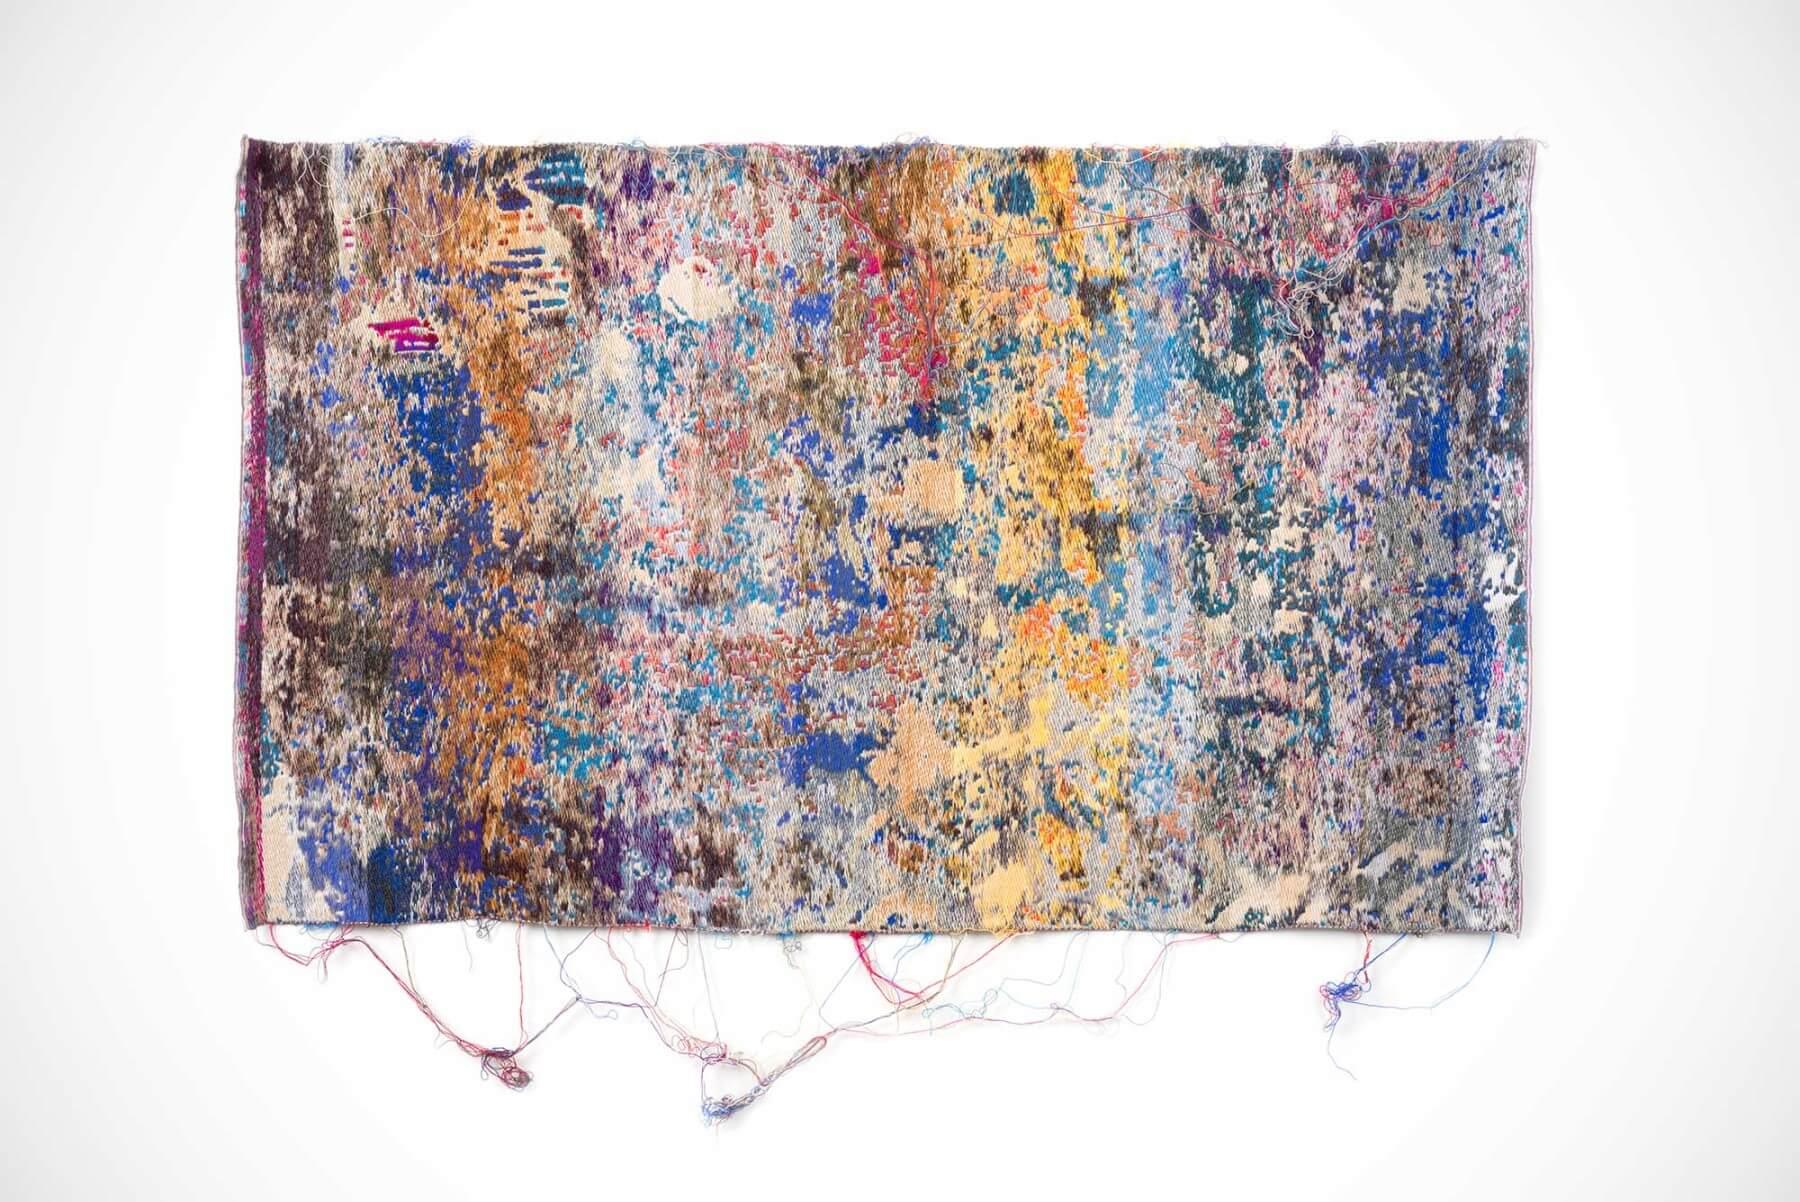 Laura Letinsky and John Paul Morabito |                              Blukarliwhidandagz - wall tapestry